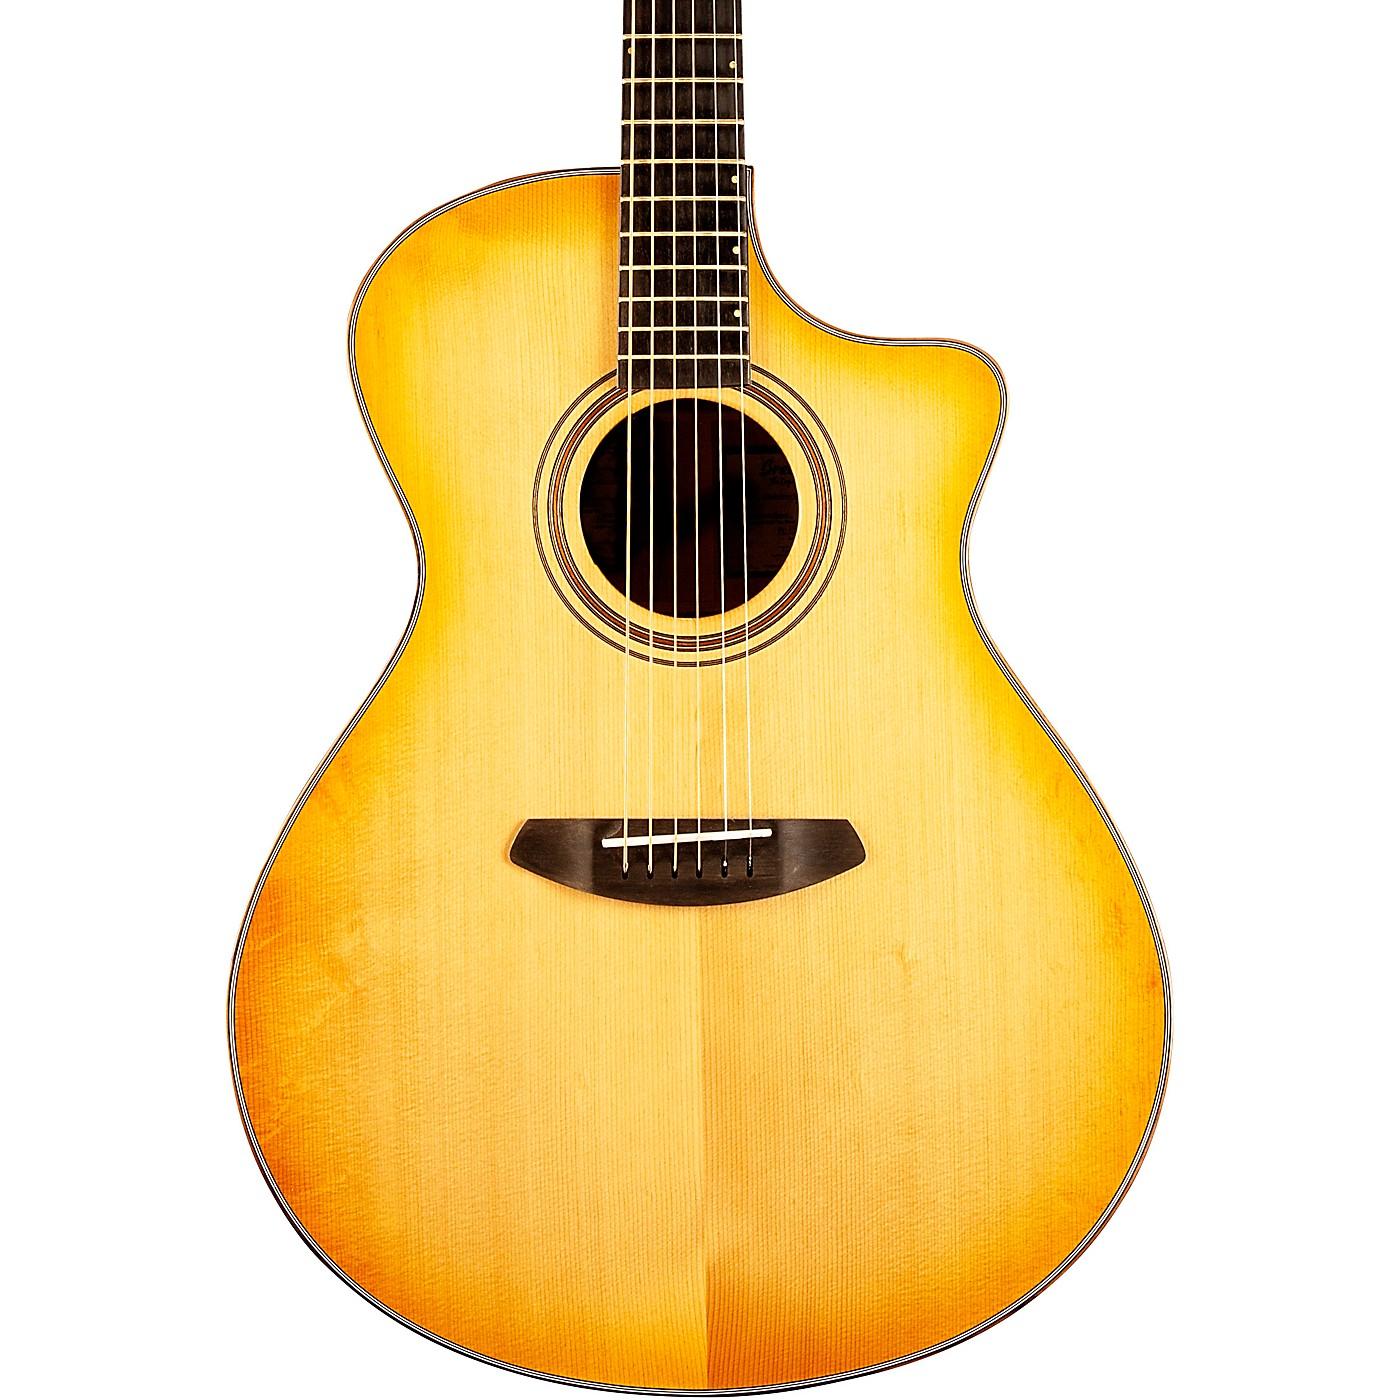 Breedlove Organic Collection Artista Concerto Cutaway CE Acoustic-Electric Guitar thumbnail